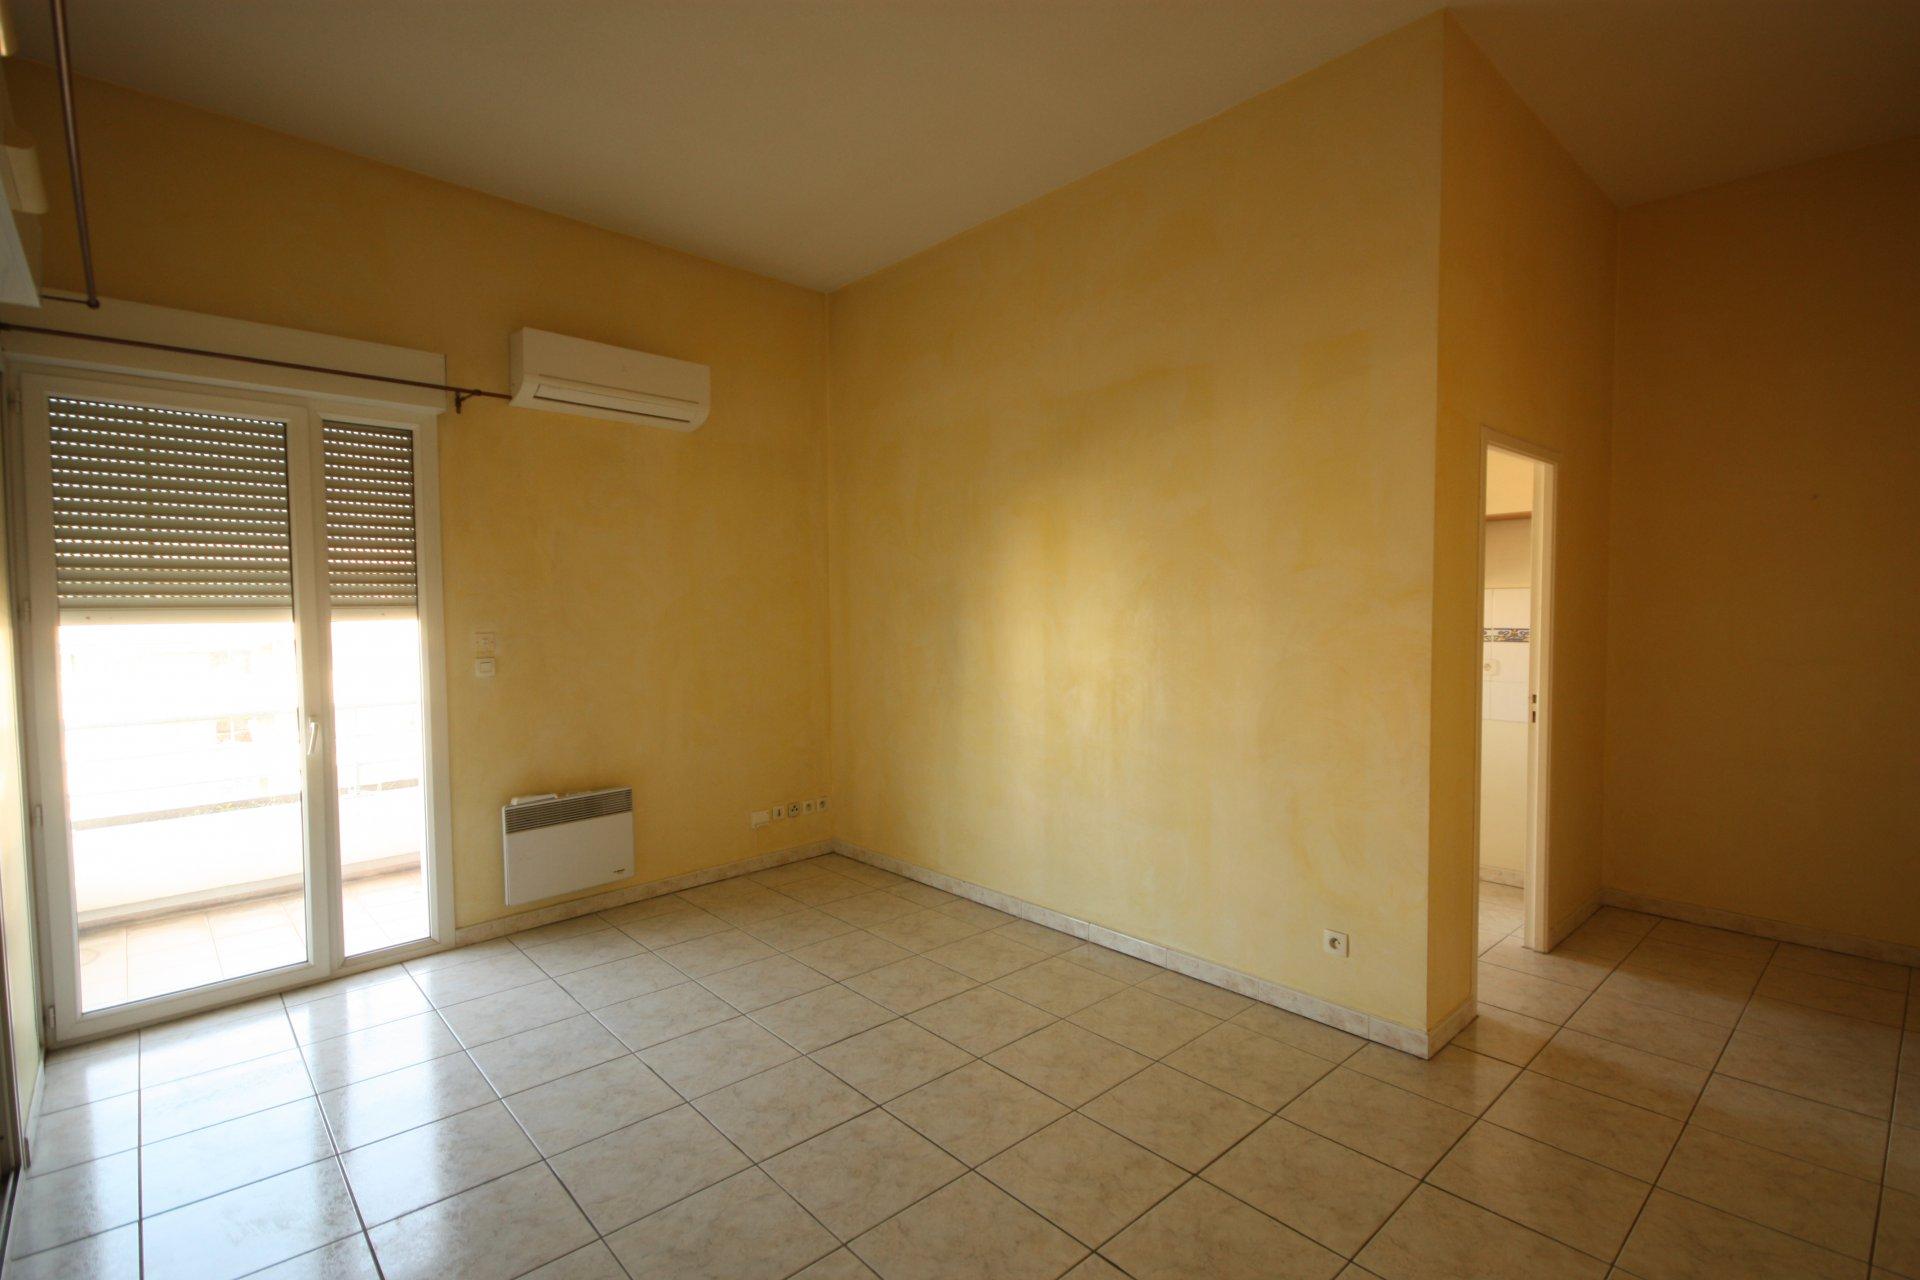 Perpignan appartement T2 avec terrasse à vendre